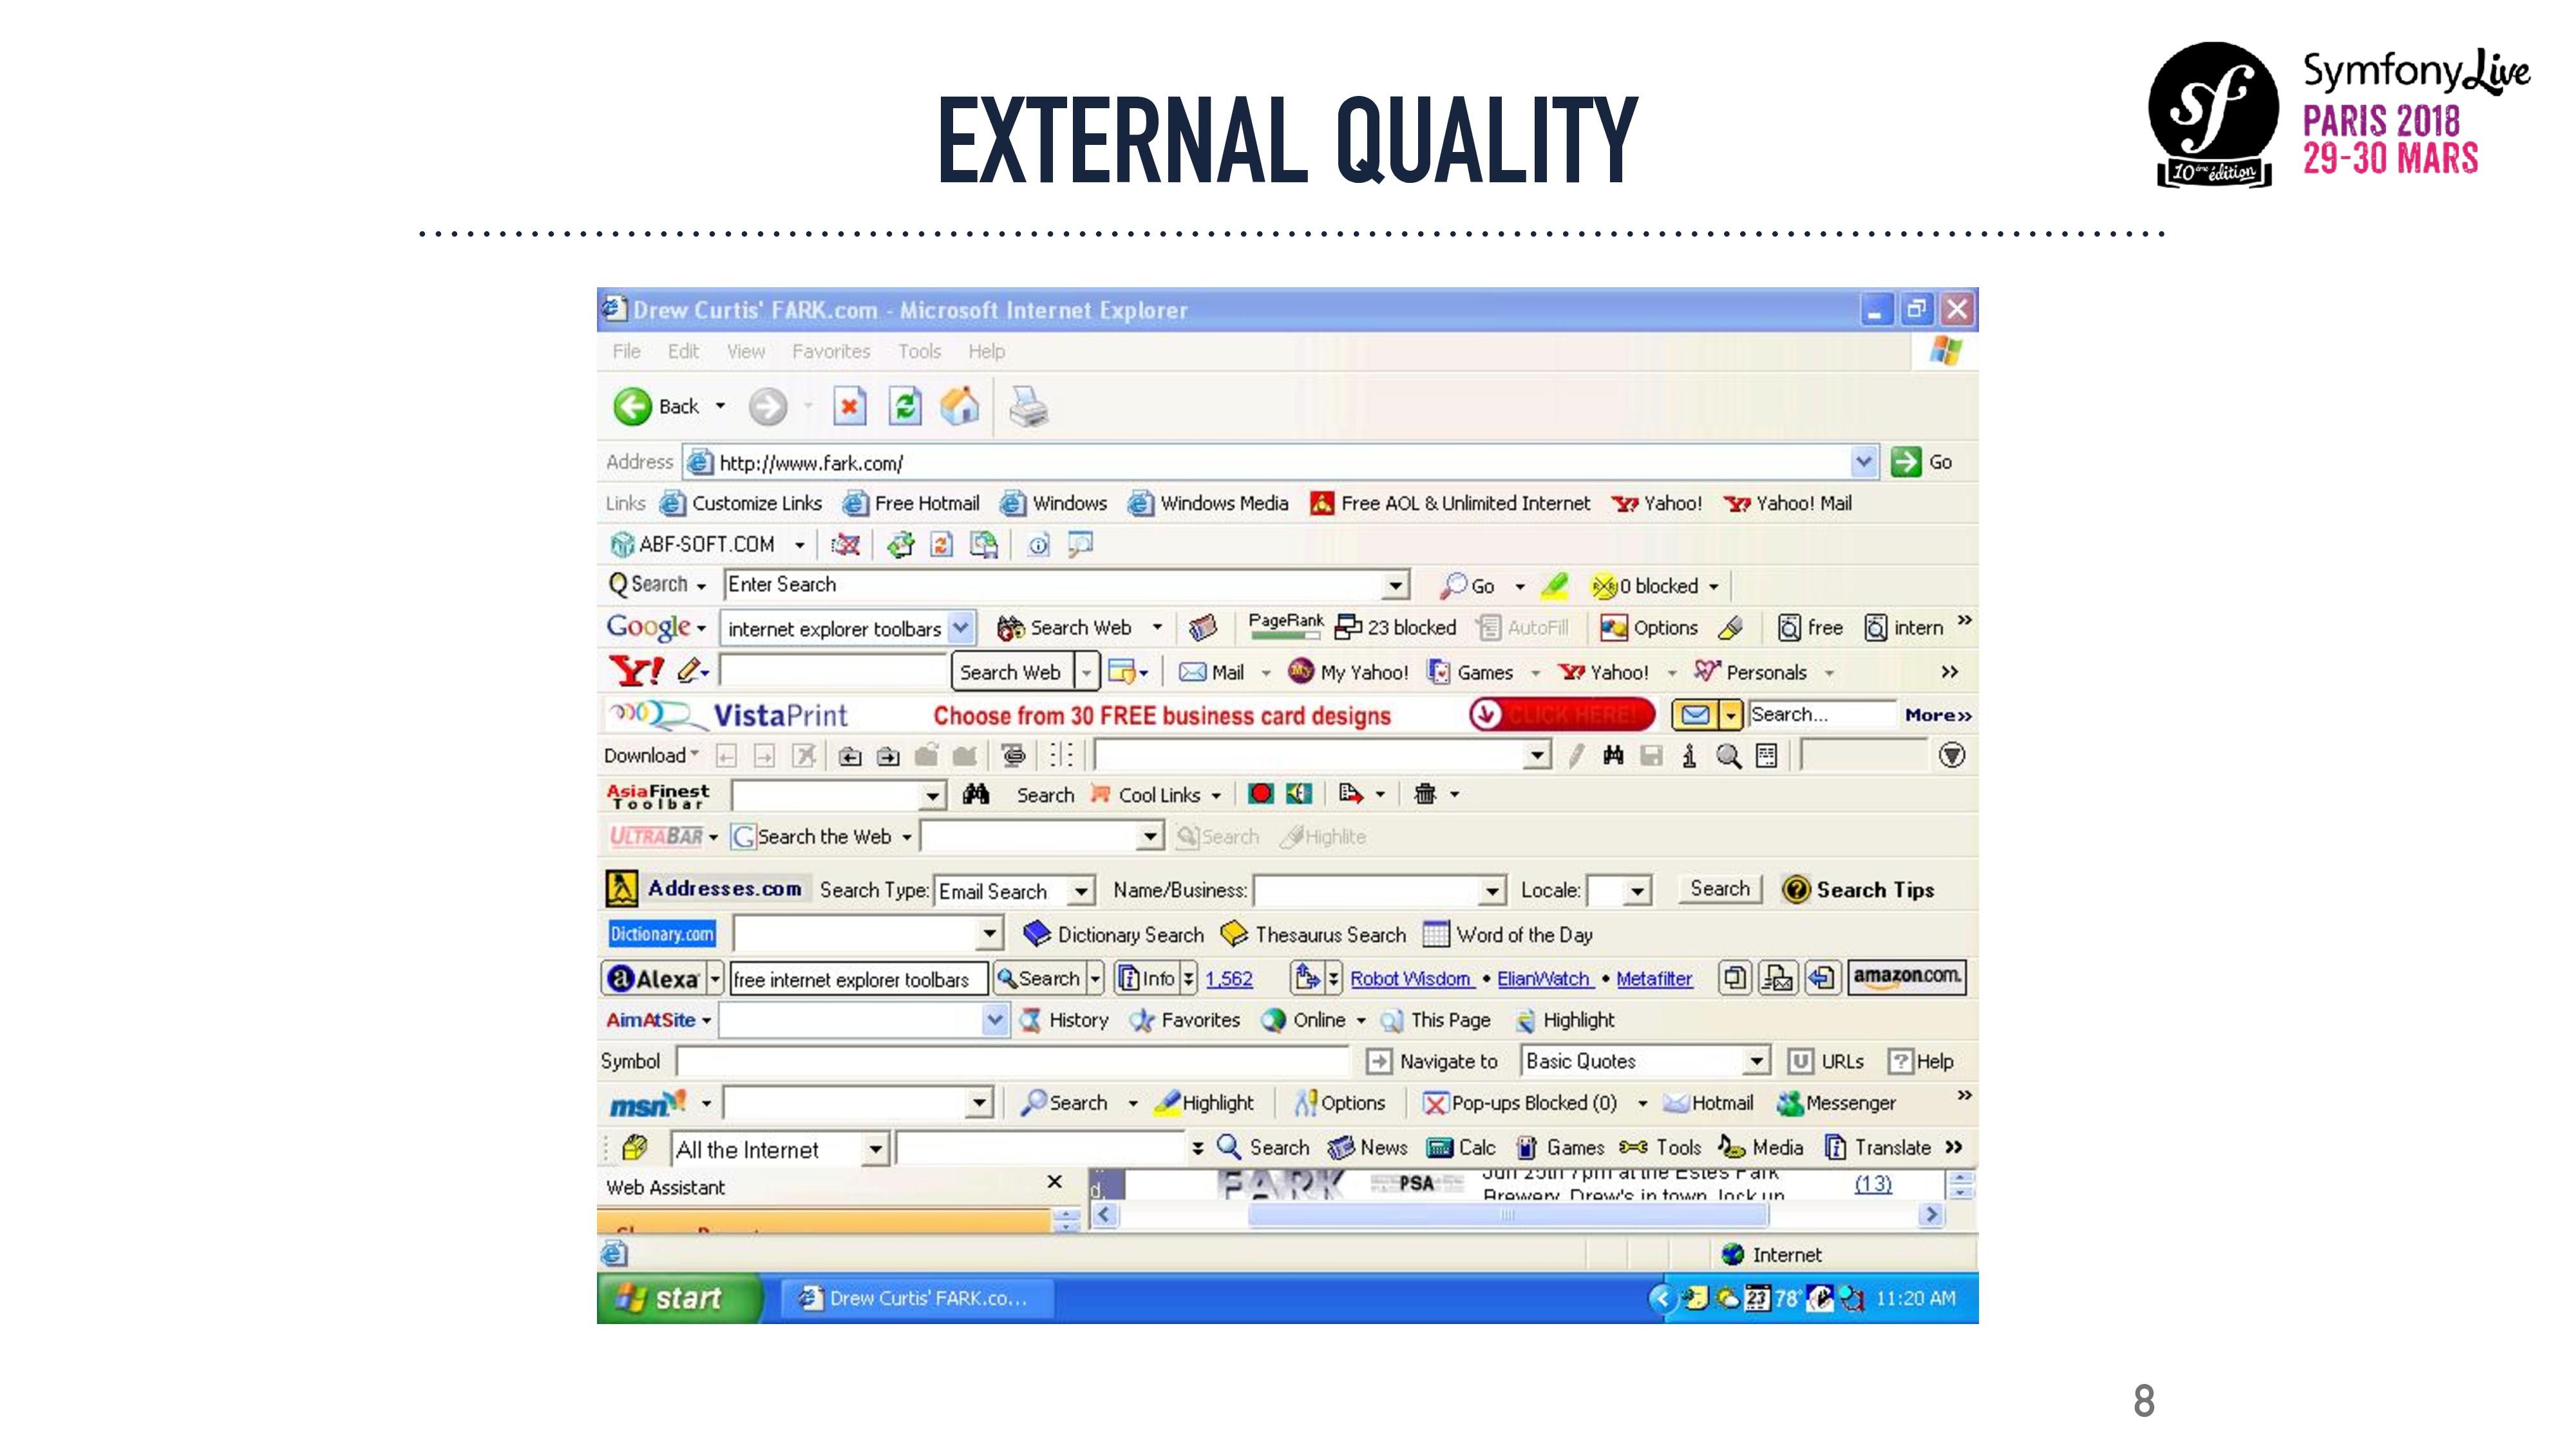 8 EXTERNAL QUALITY